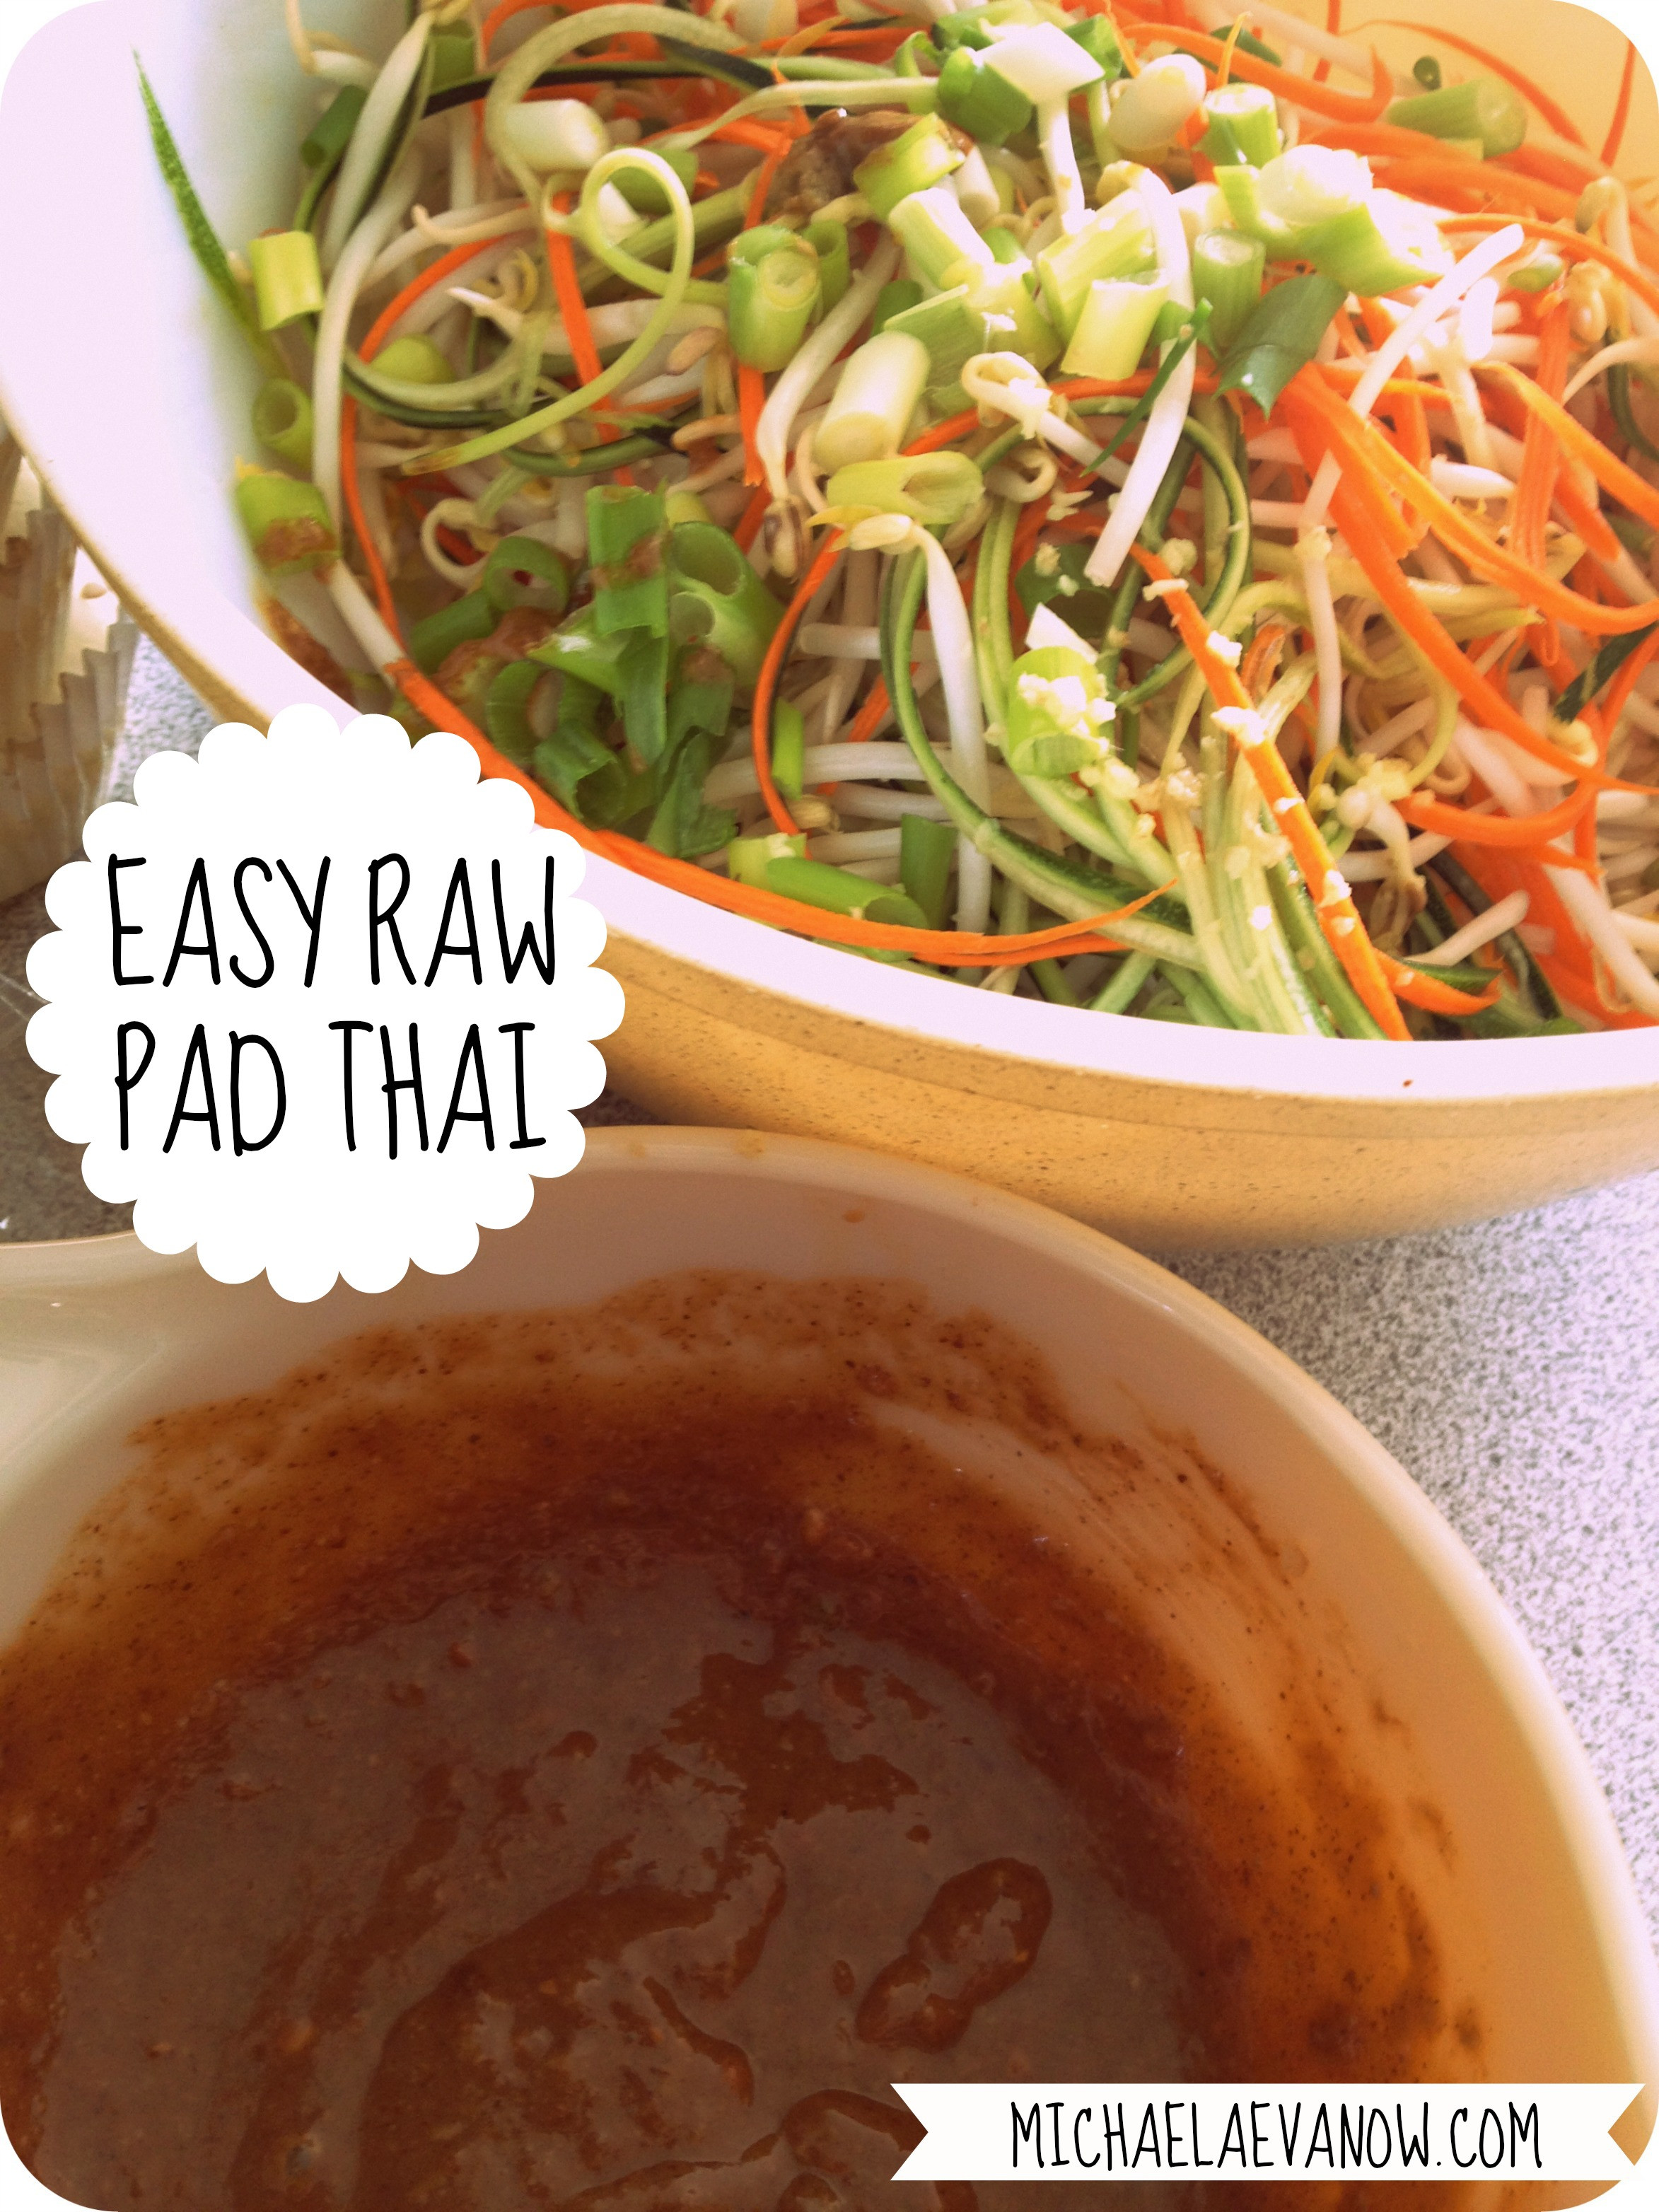 Healthy Pad Thai Sauce  savouring the end of summer raw pad thai – Michaela Evanow